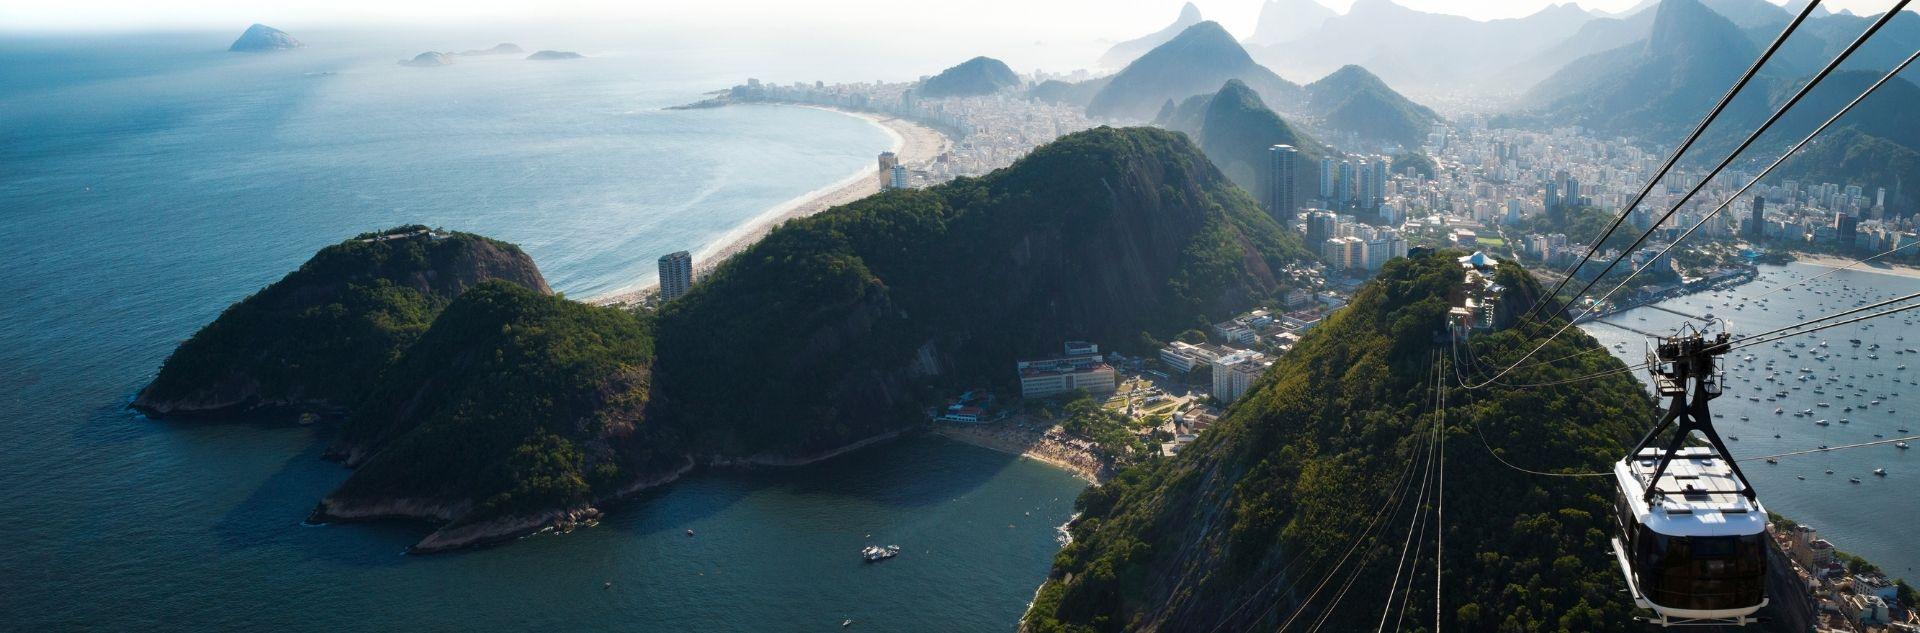 Reiseziel Südamerika - Rio de Janeiro, Brasilien